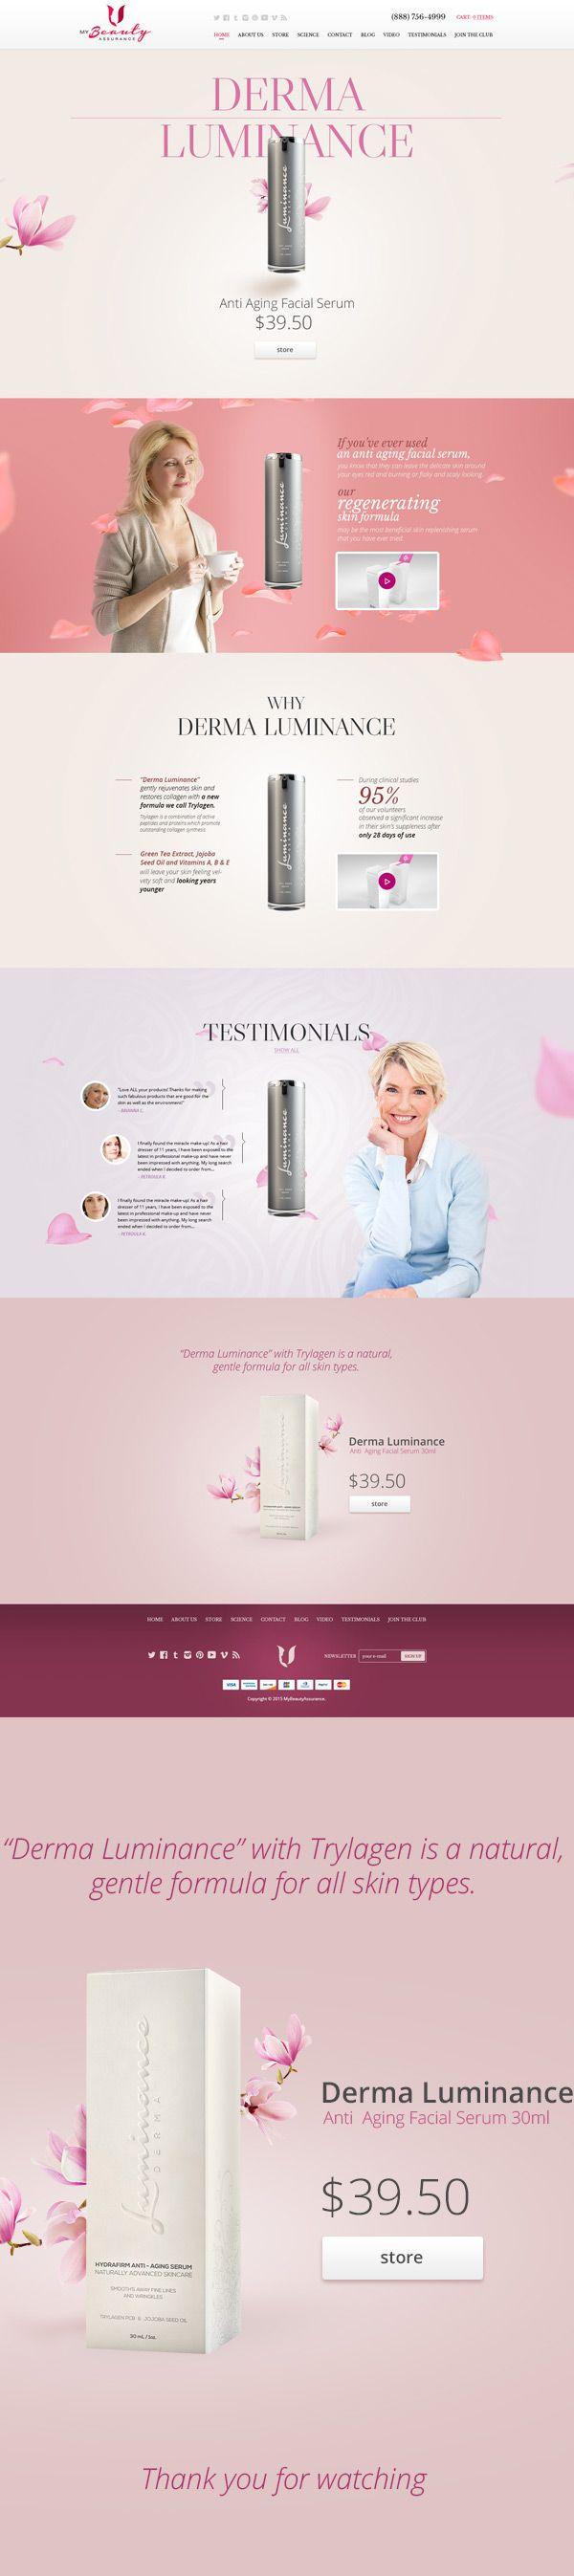 Web design / Landing page. Beauty Product Promotions - Derma Luminance.